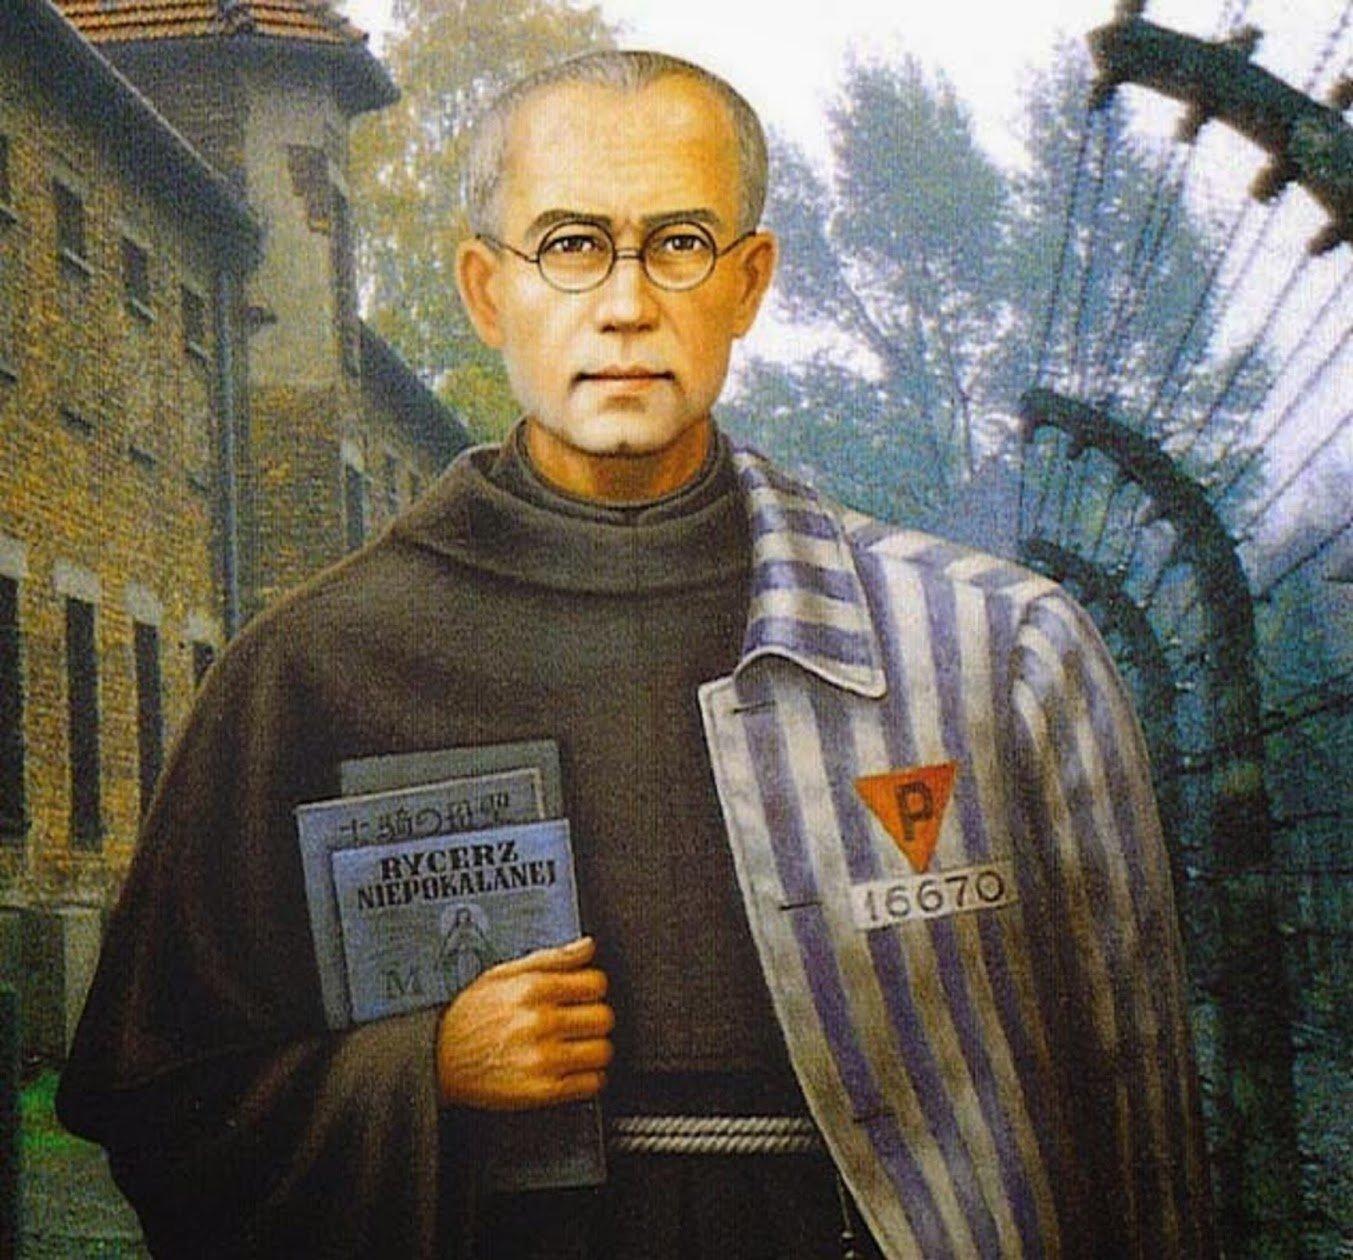 14 de agosto, San Maximiliano Kolbe: desde joven sabía qu...